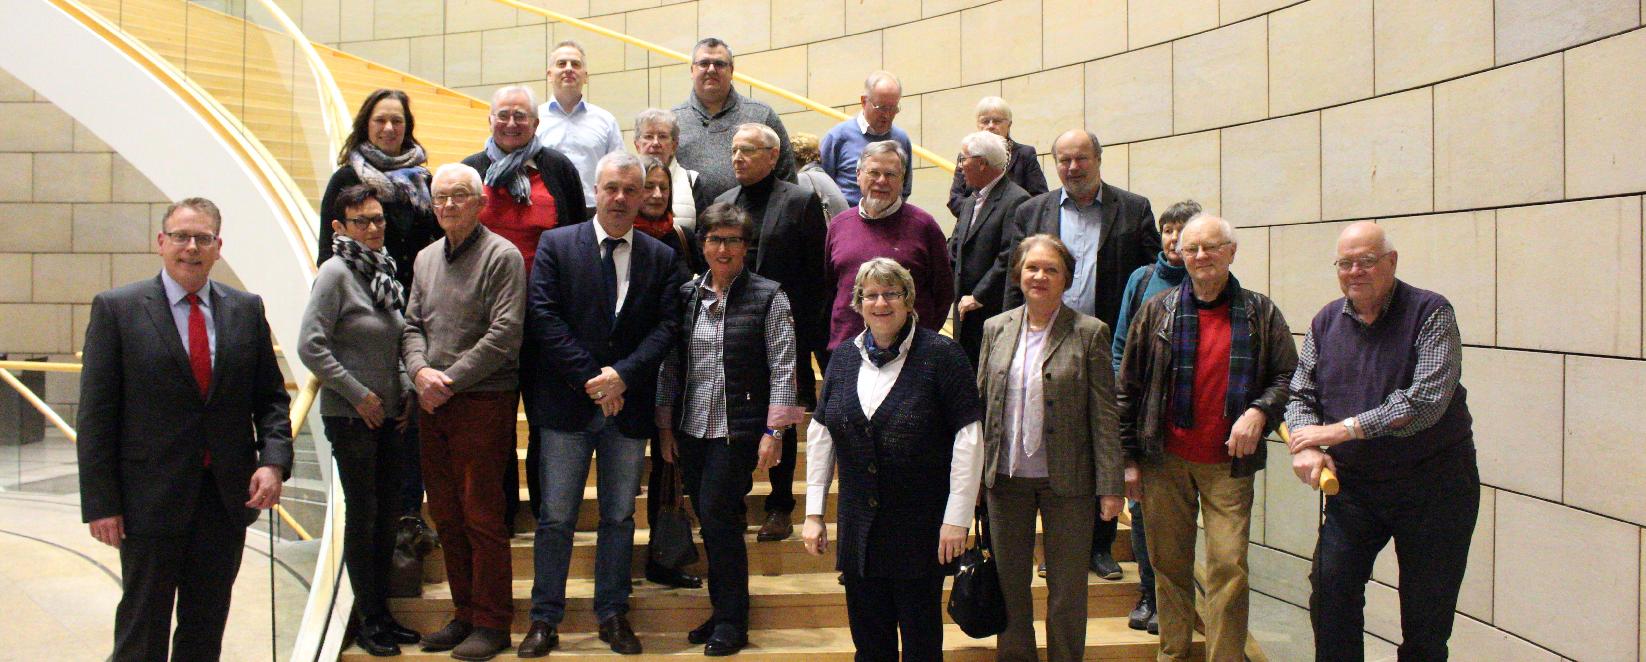 CDU Krefeld zu Gast im Düsseldorfer Landtag